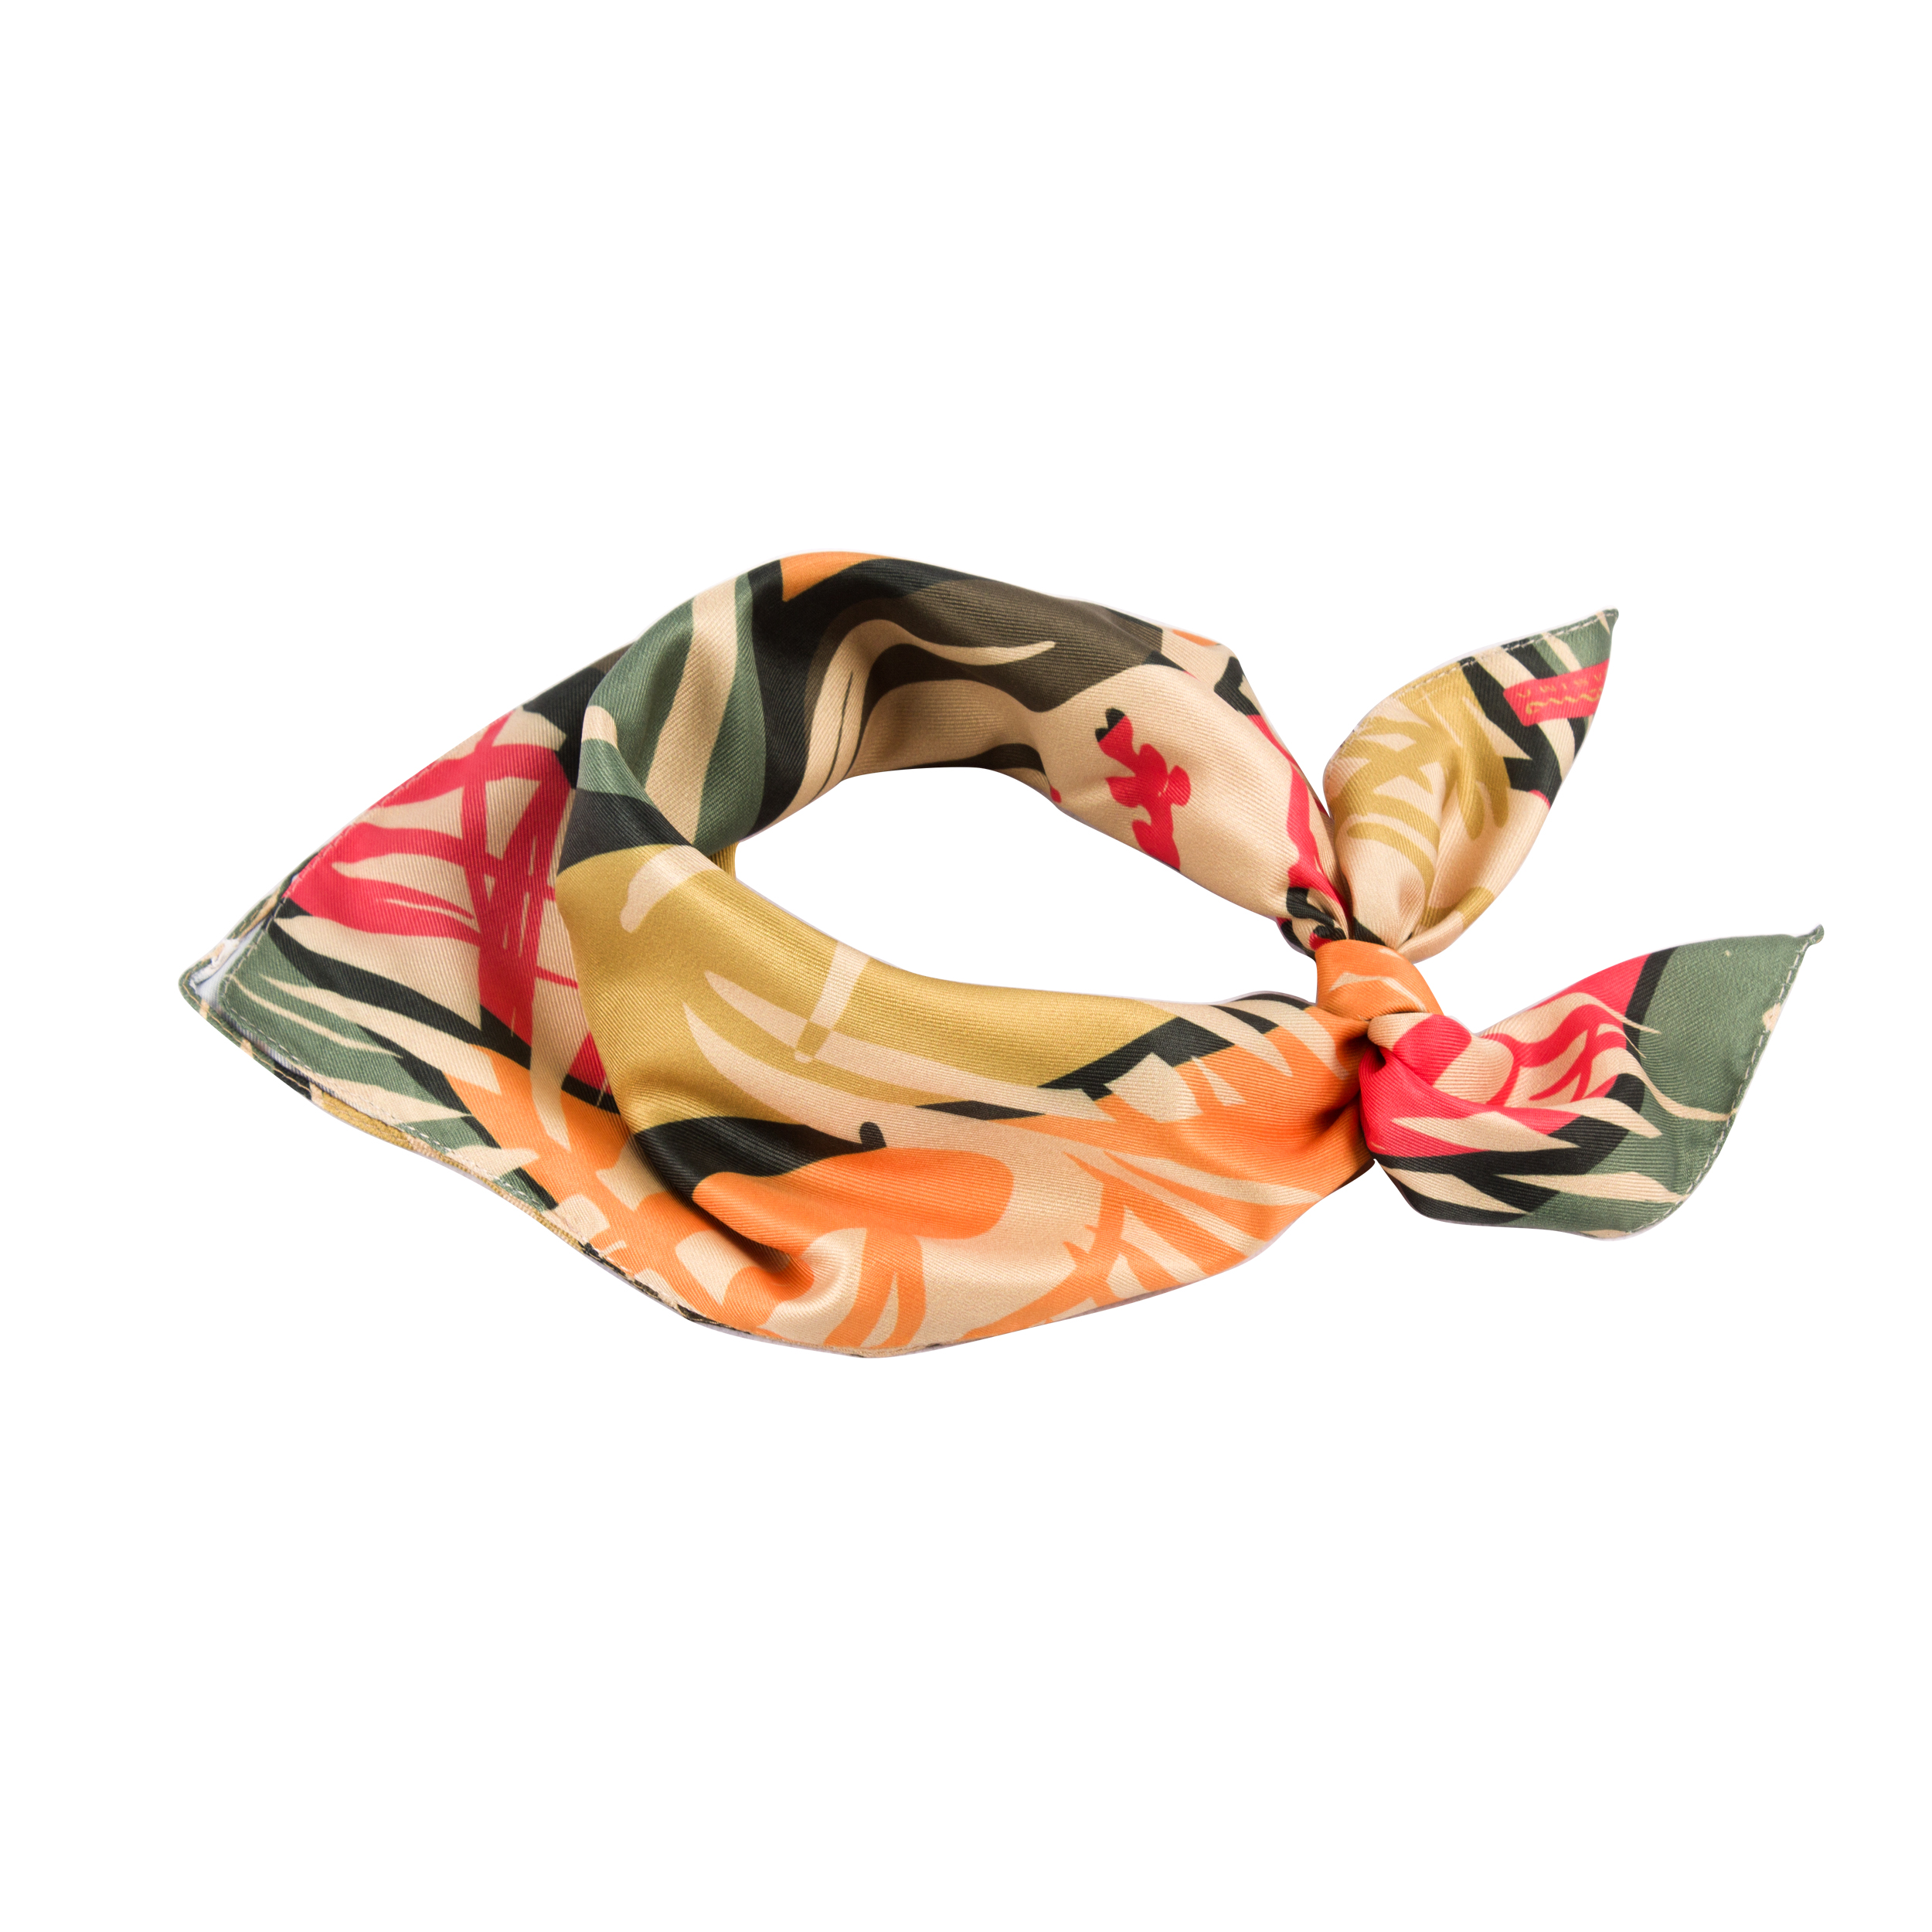 دستمال گردن زنانه نسیما کد N 114